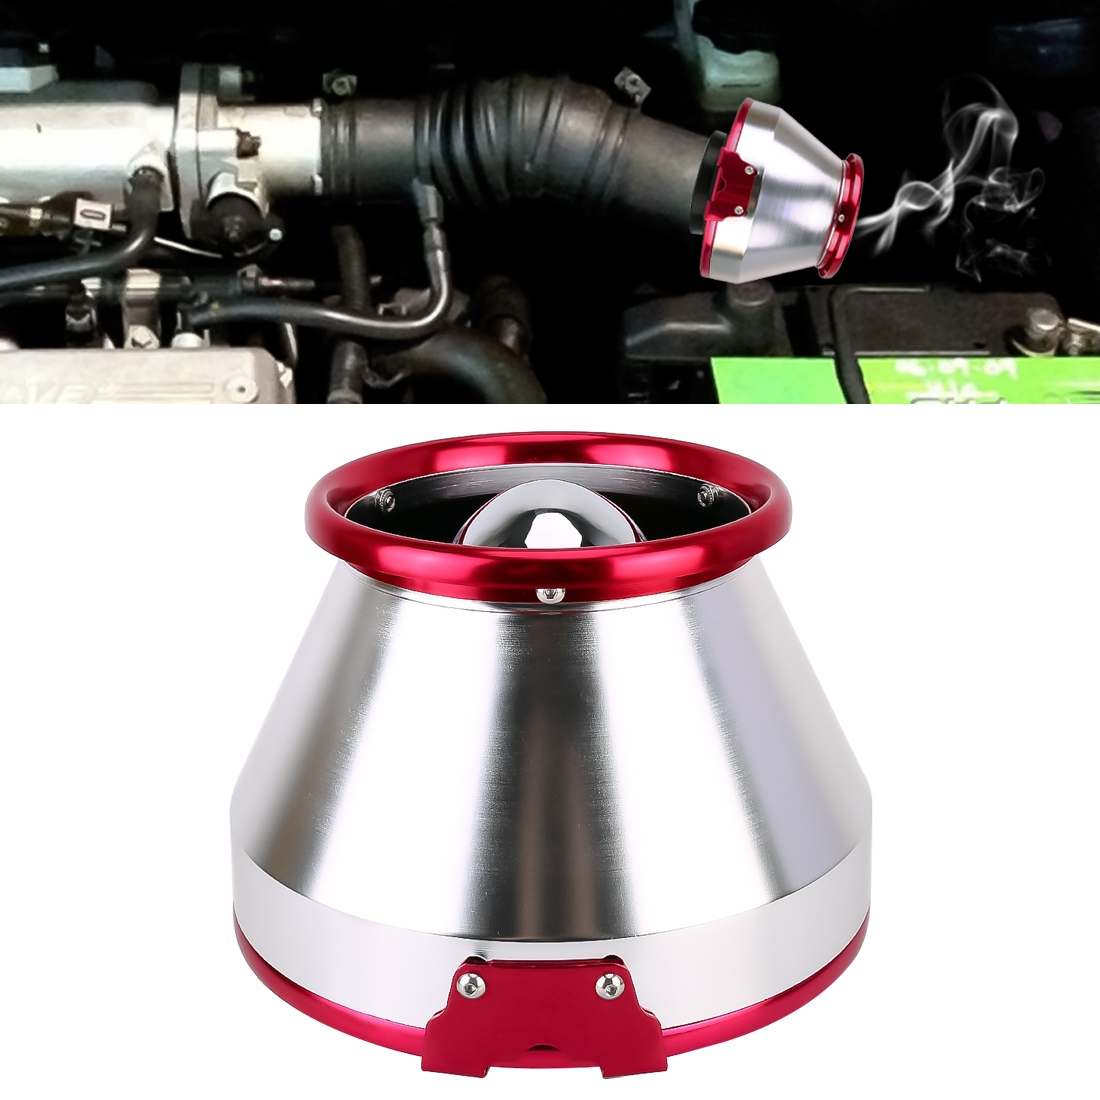 APC Mushroom Shape Super Power Car Cleaner Air Filter High Performance Air Induction Air Flow Filter, Inner Caliber: 7.6cm